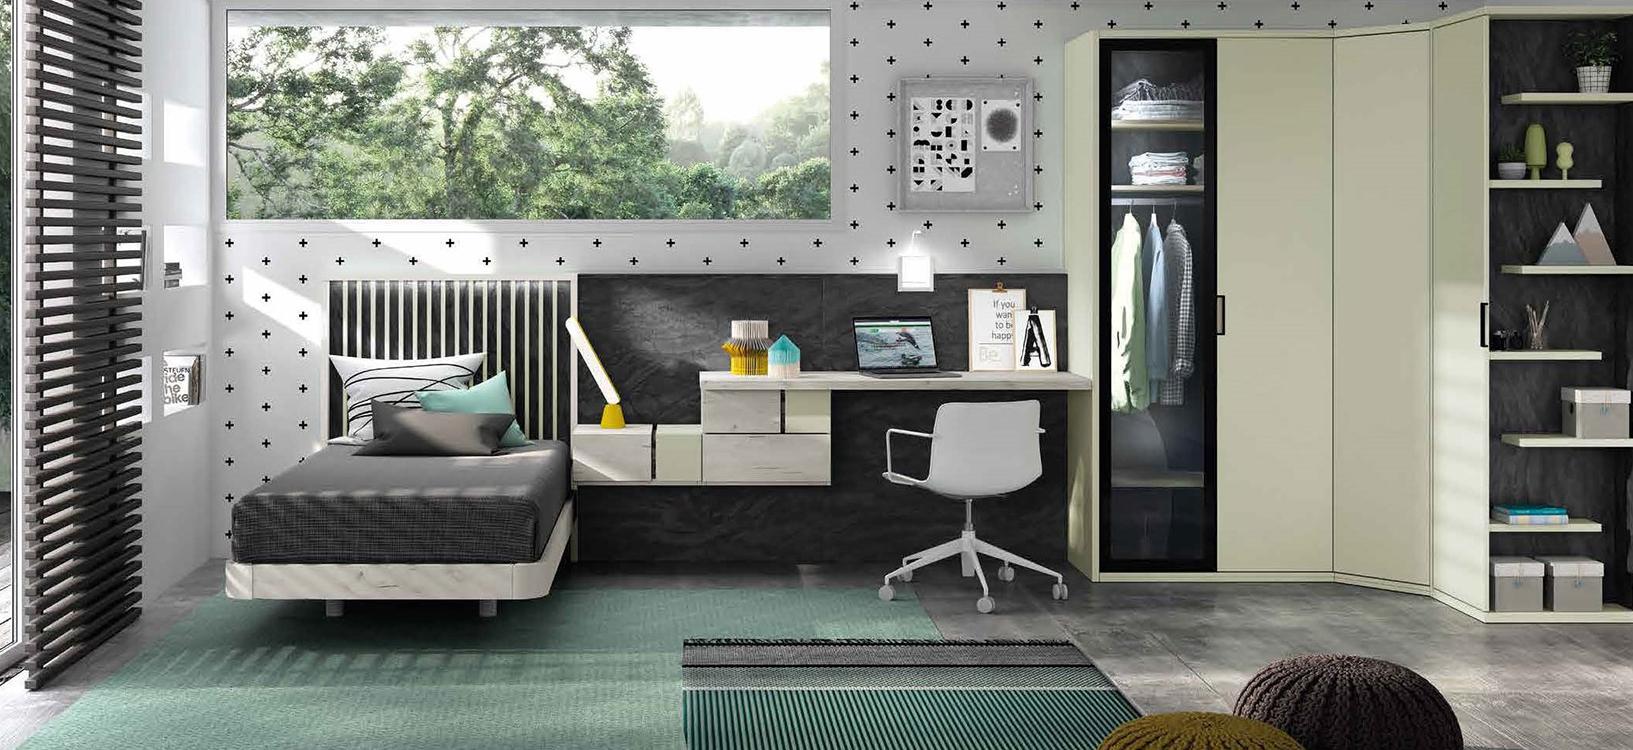 http://www.munozmuebles.net/nueva/catalogo/juveniles-modulares.html - Comprar  muebles modulares